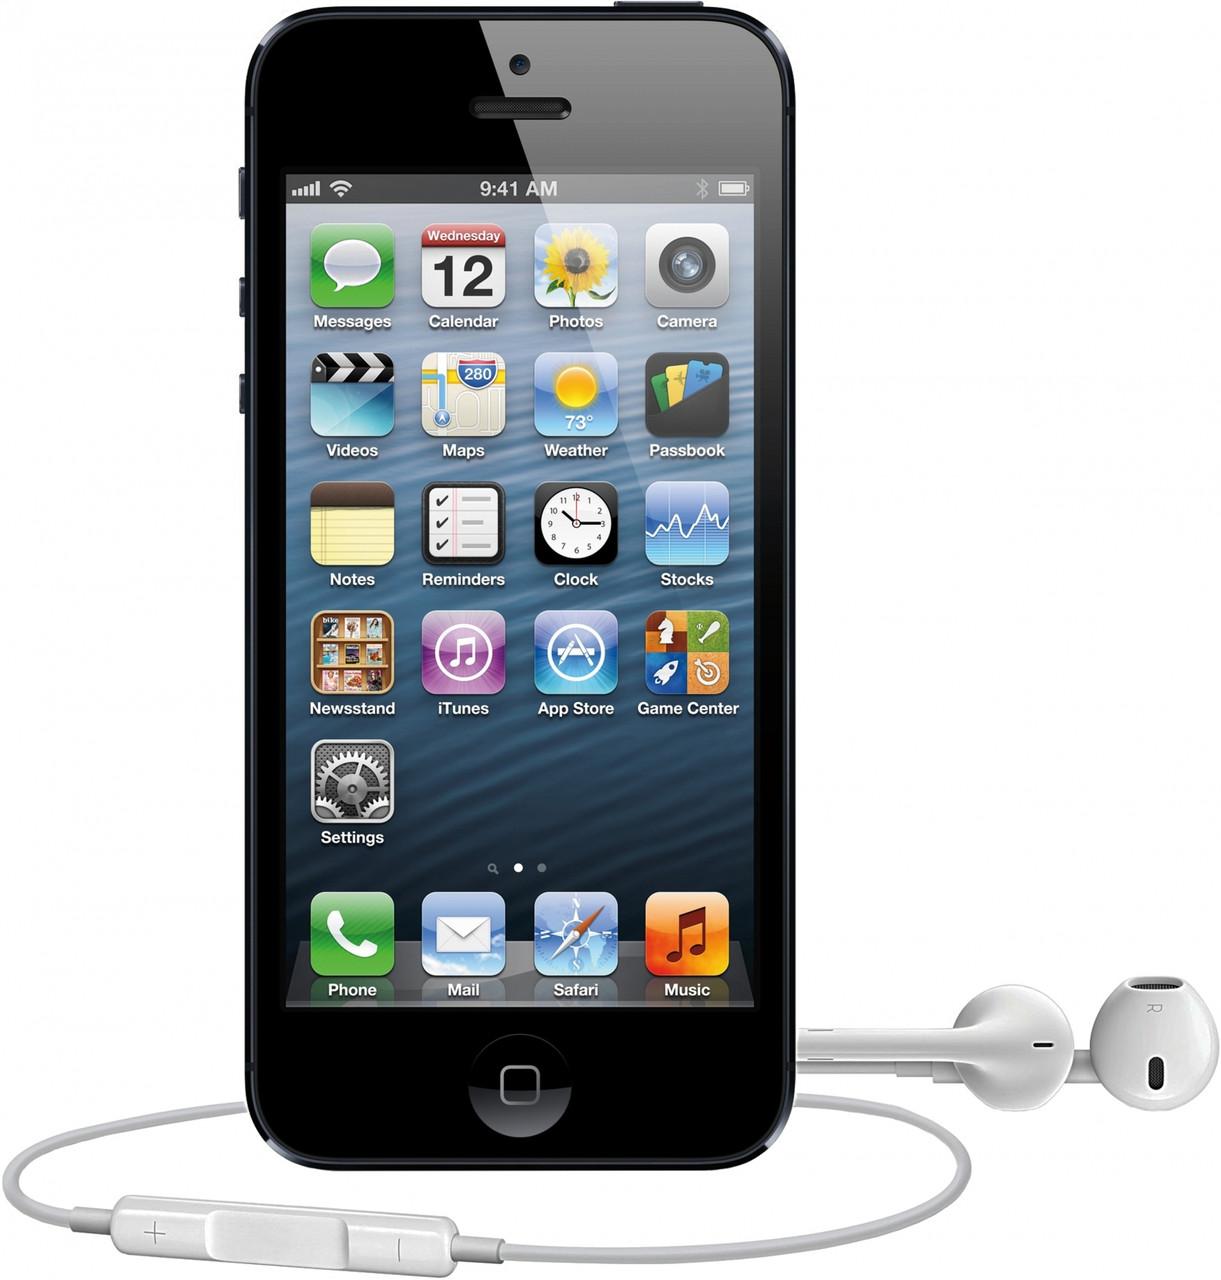 Apple iPhone 5 64GB (Black) Refurbished